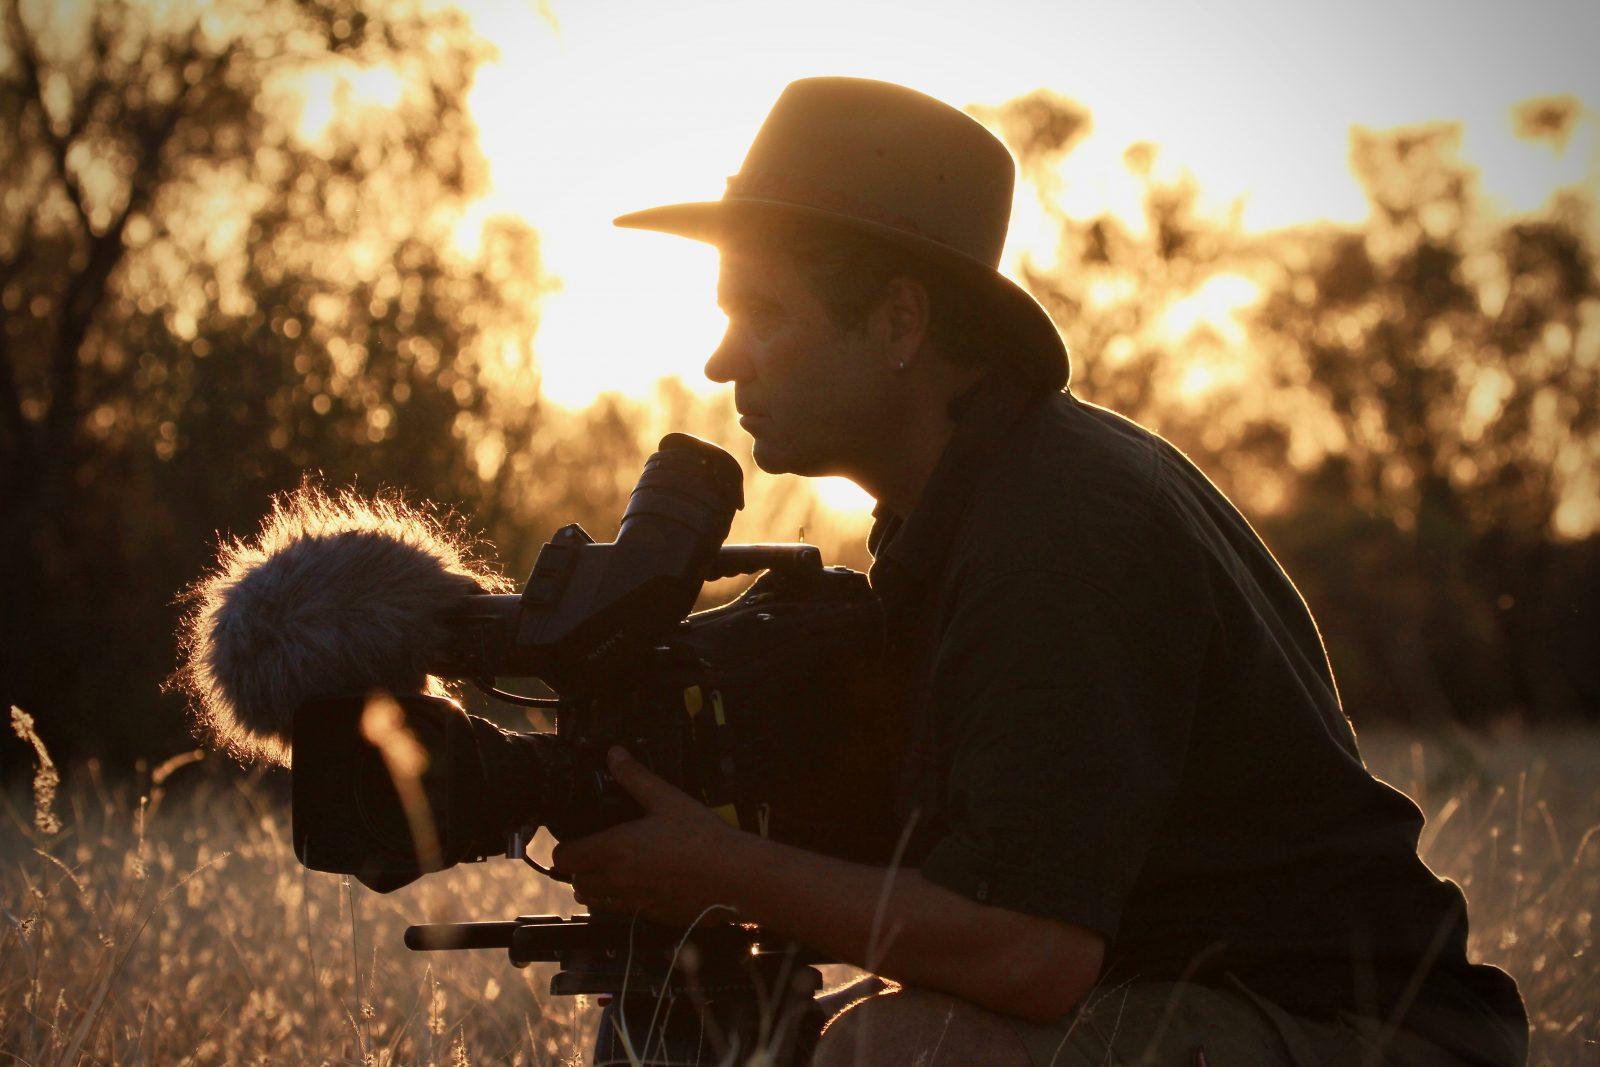 jens-westphalen-filmemacher-outback-zorillafilm-grospitz-westphalen